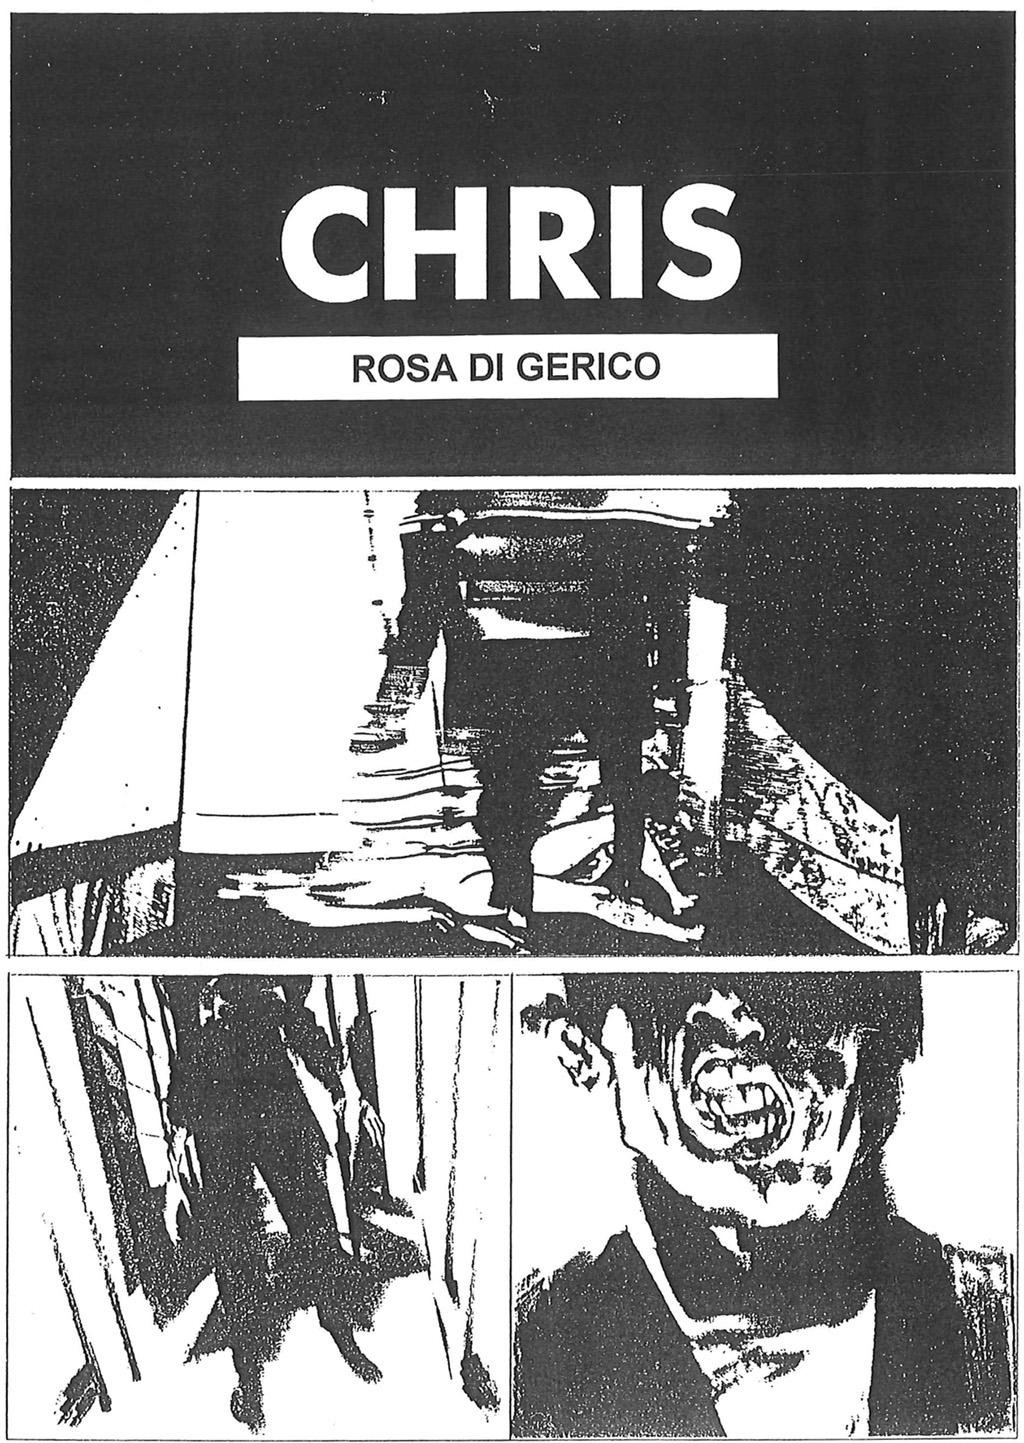 Chris Carella Graphic Novel #01